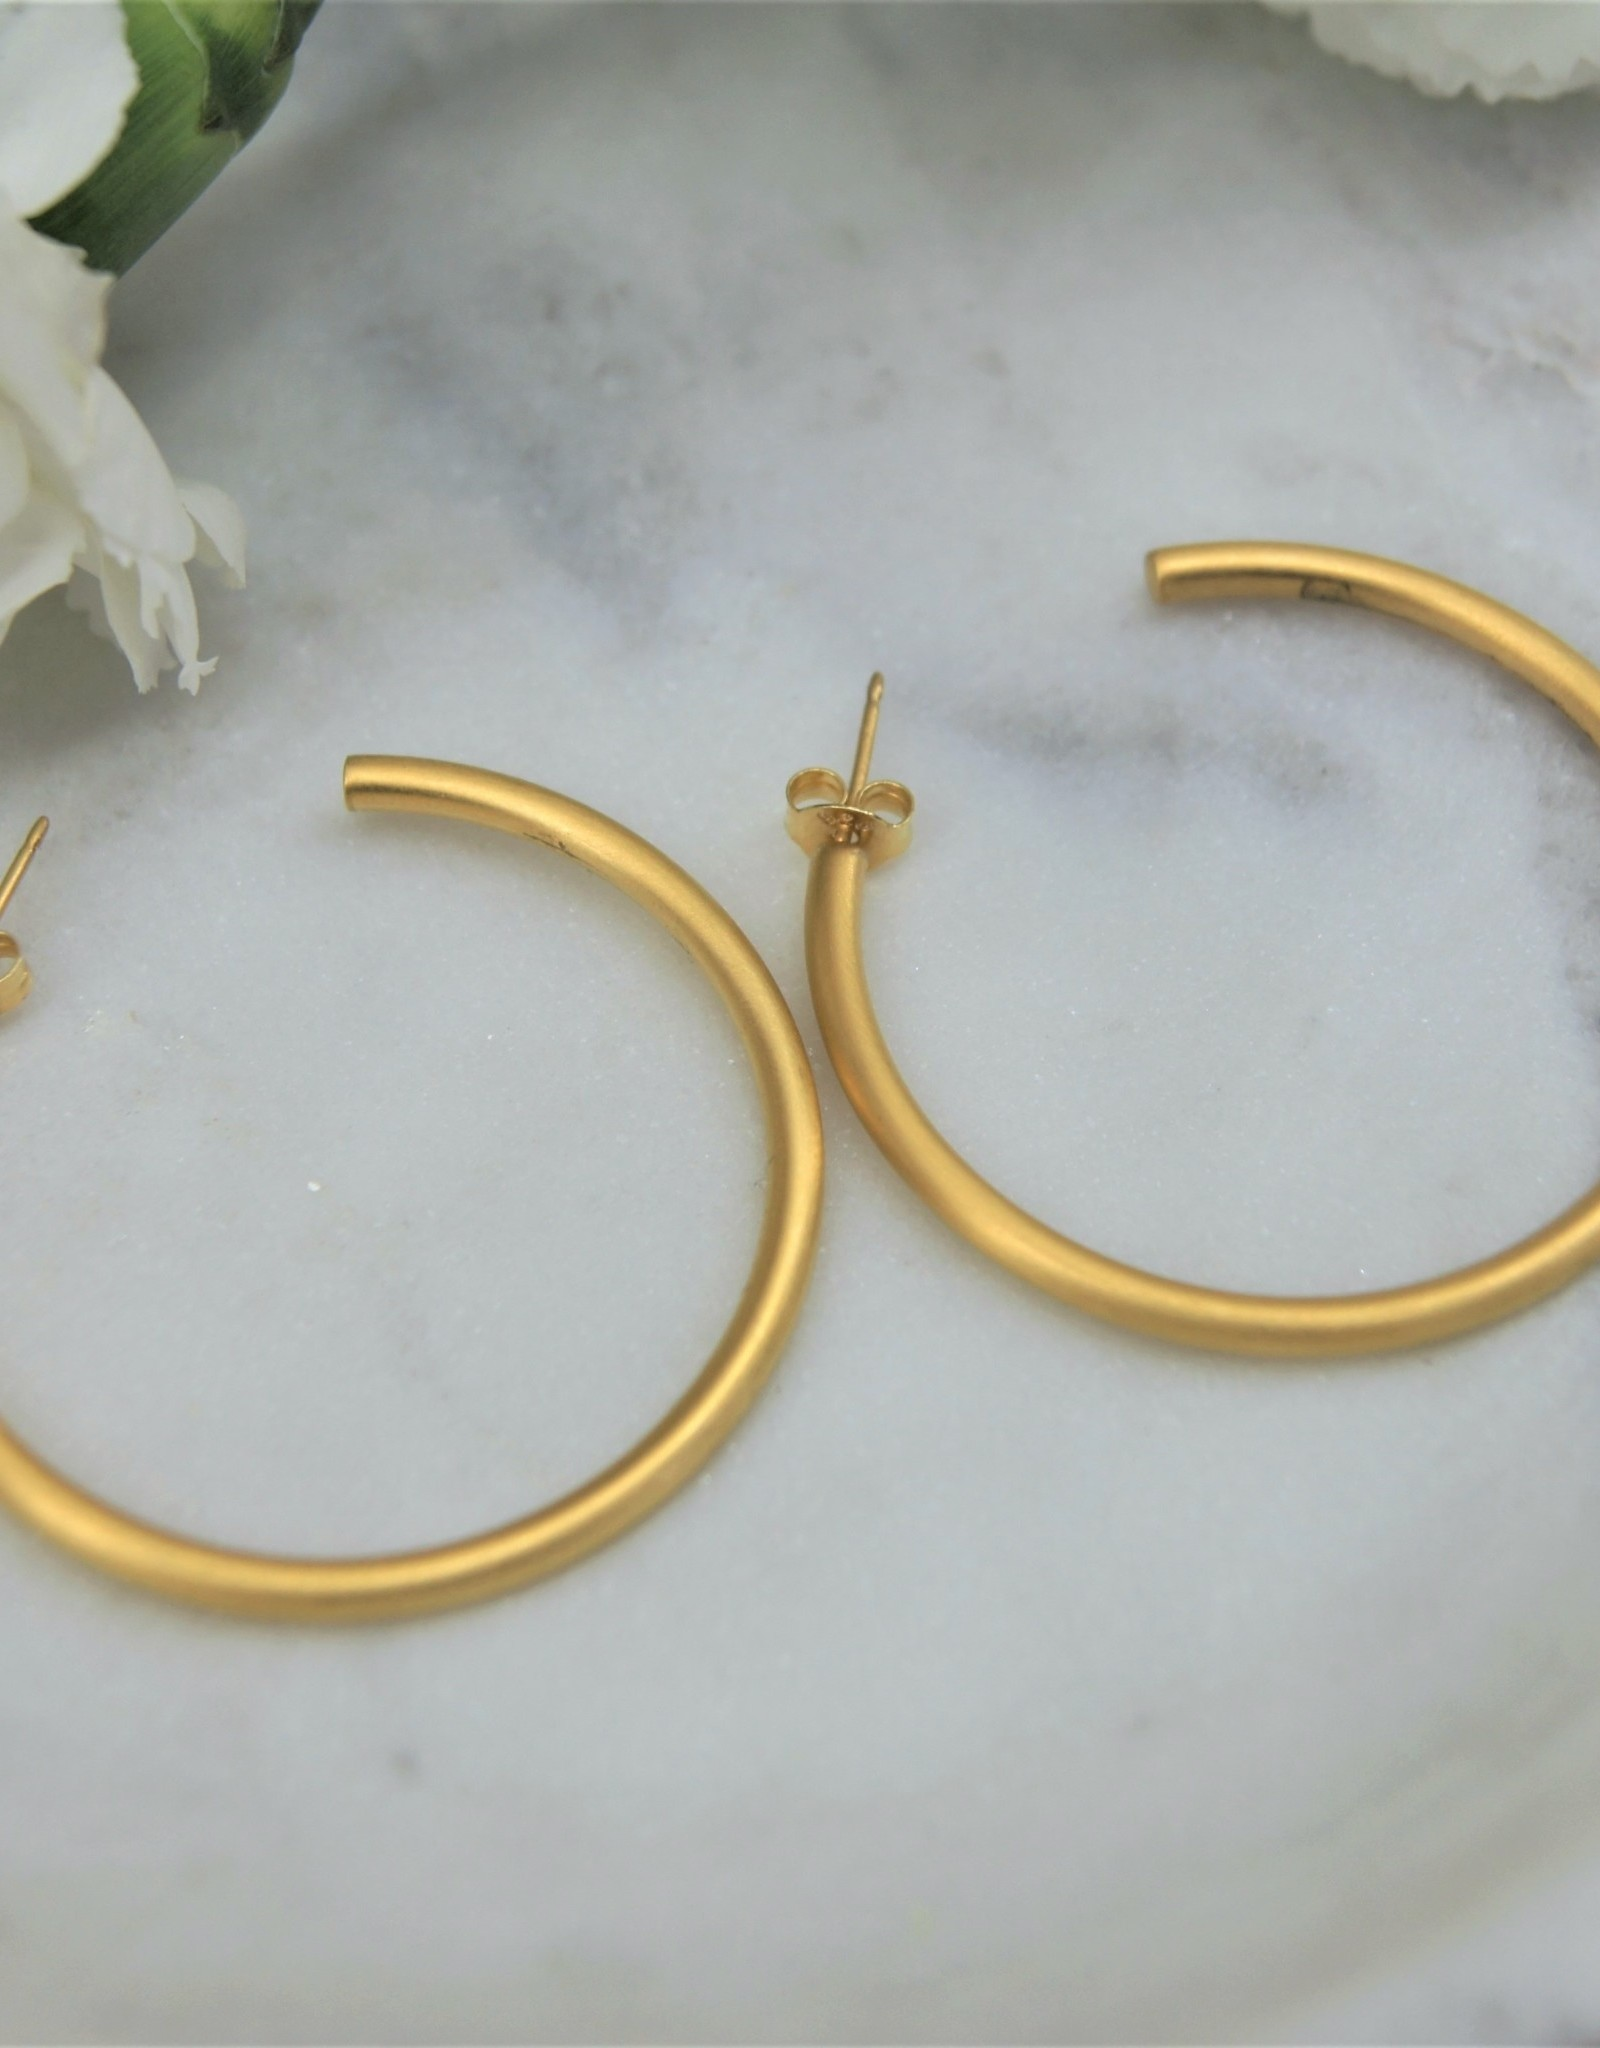 Tashi 40mm Tube Hoop - Brushed Gold Vermeil